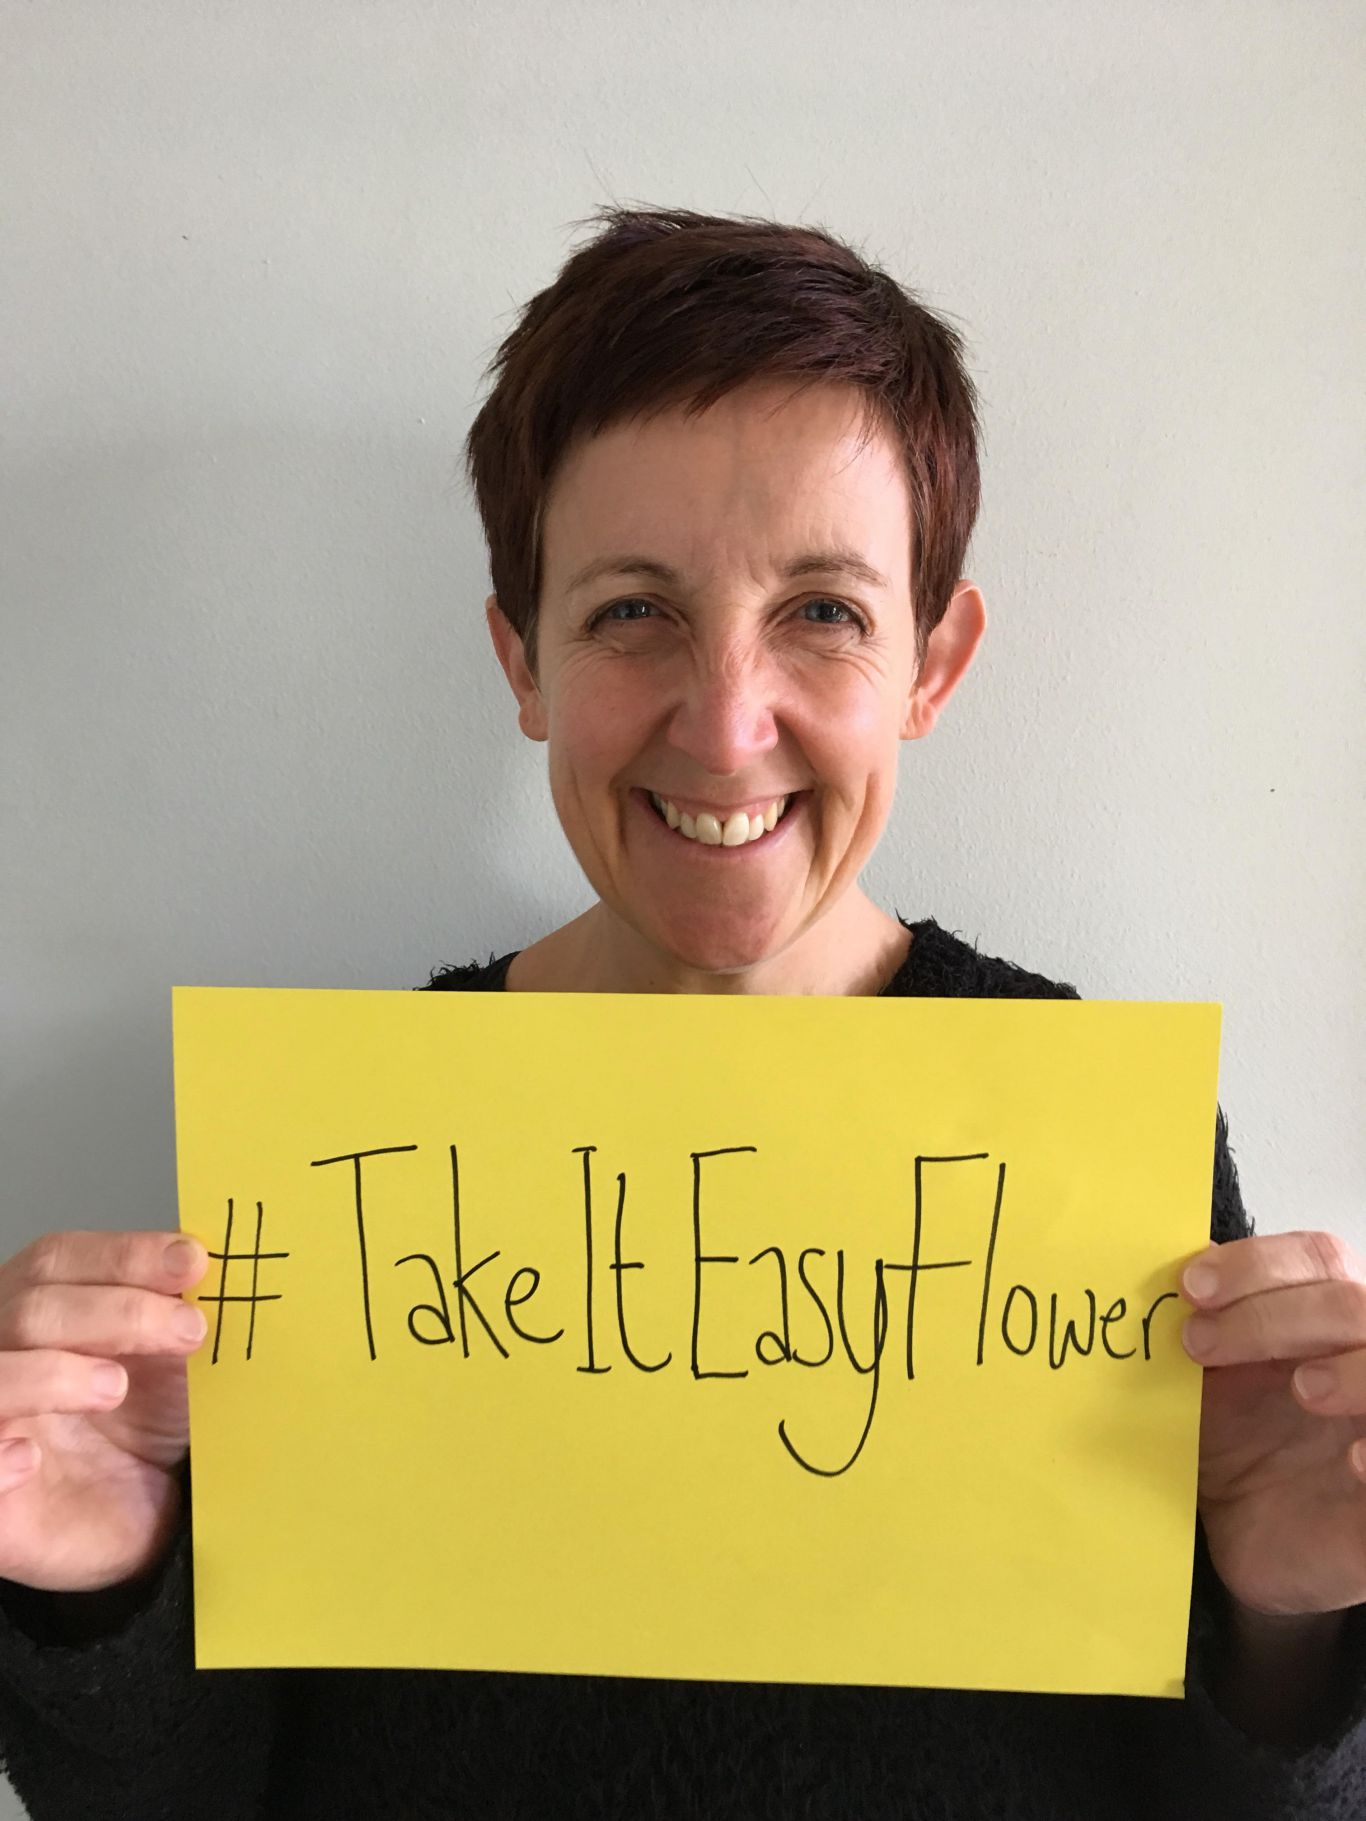 Julie Hesmondhalgh has got behind the campaign. Photo: MJC